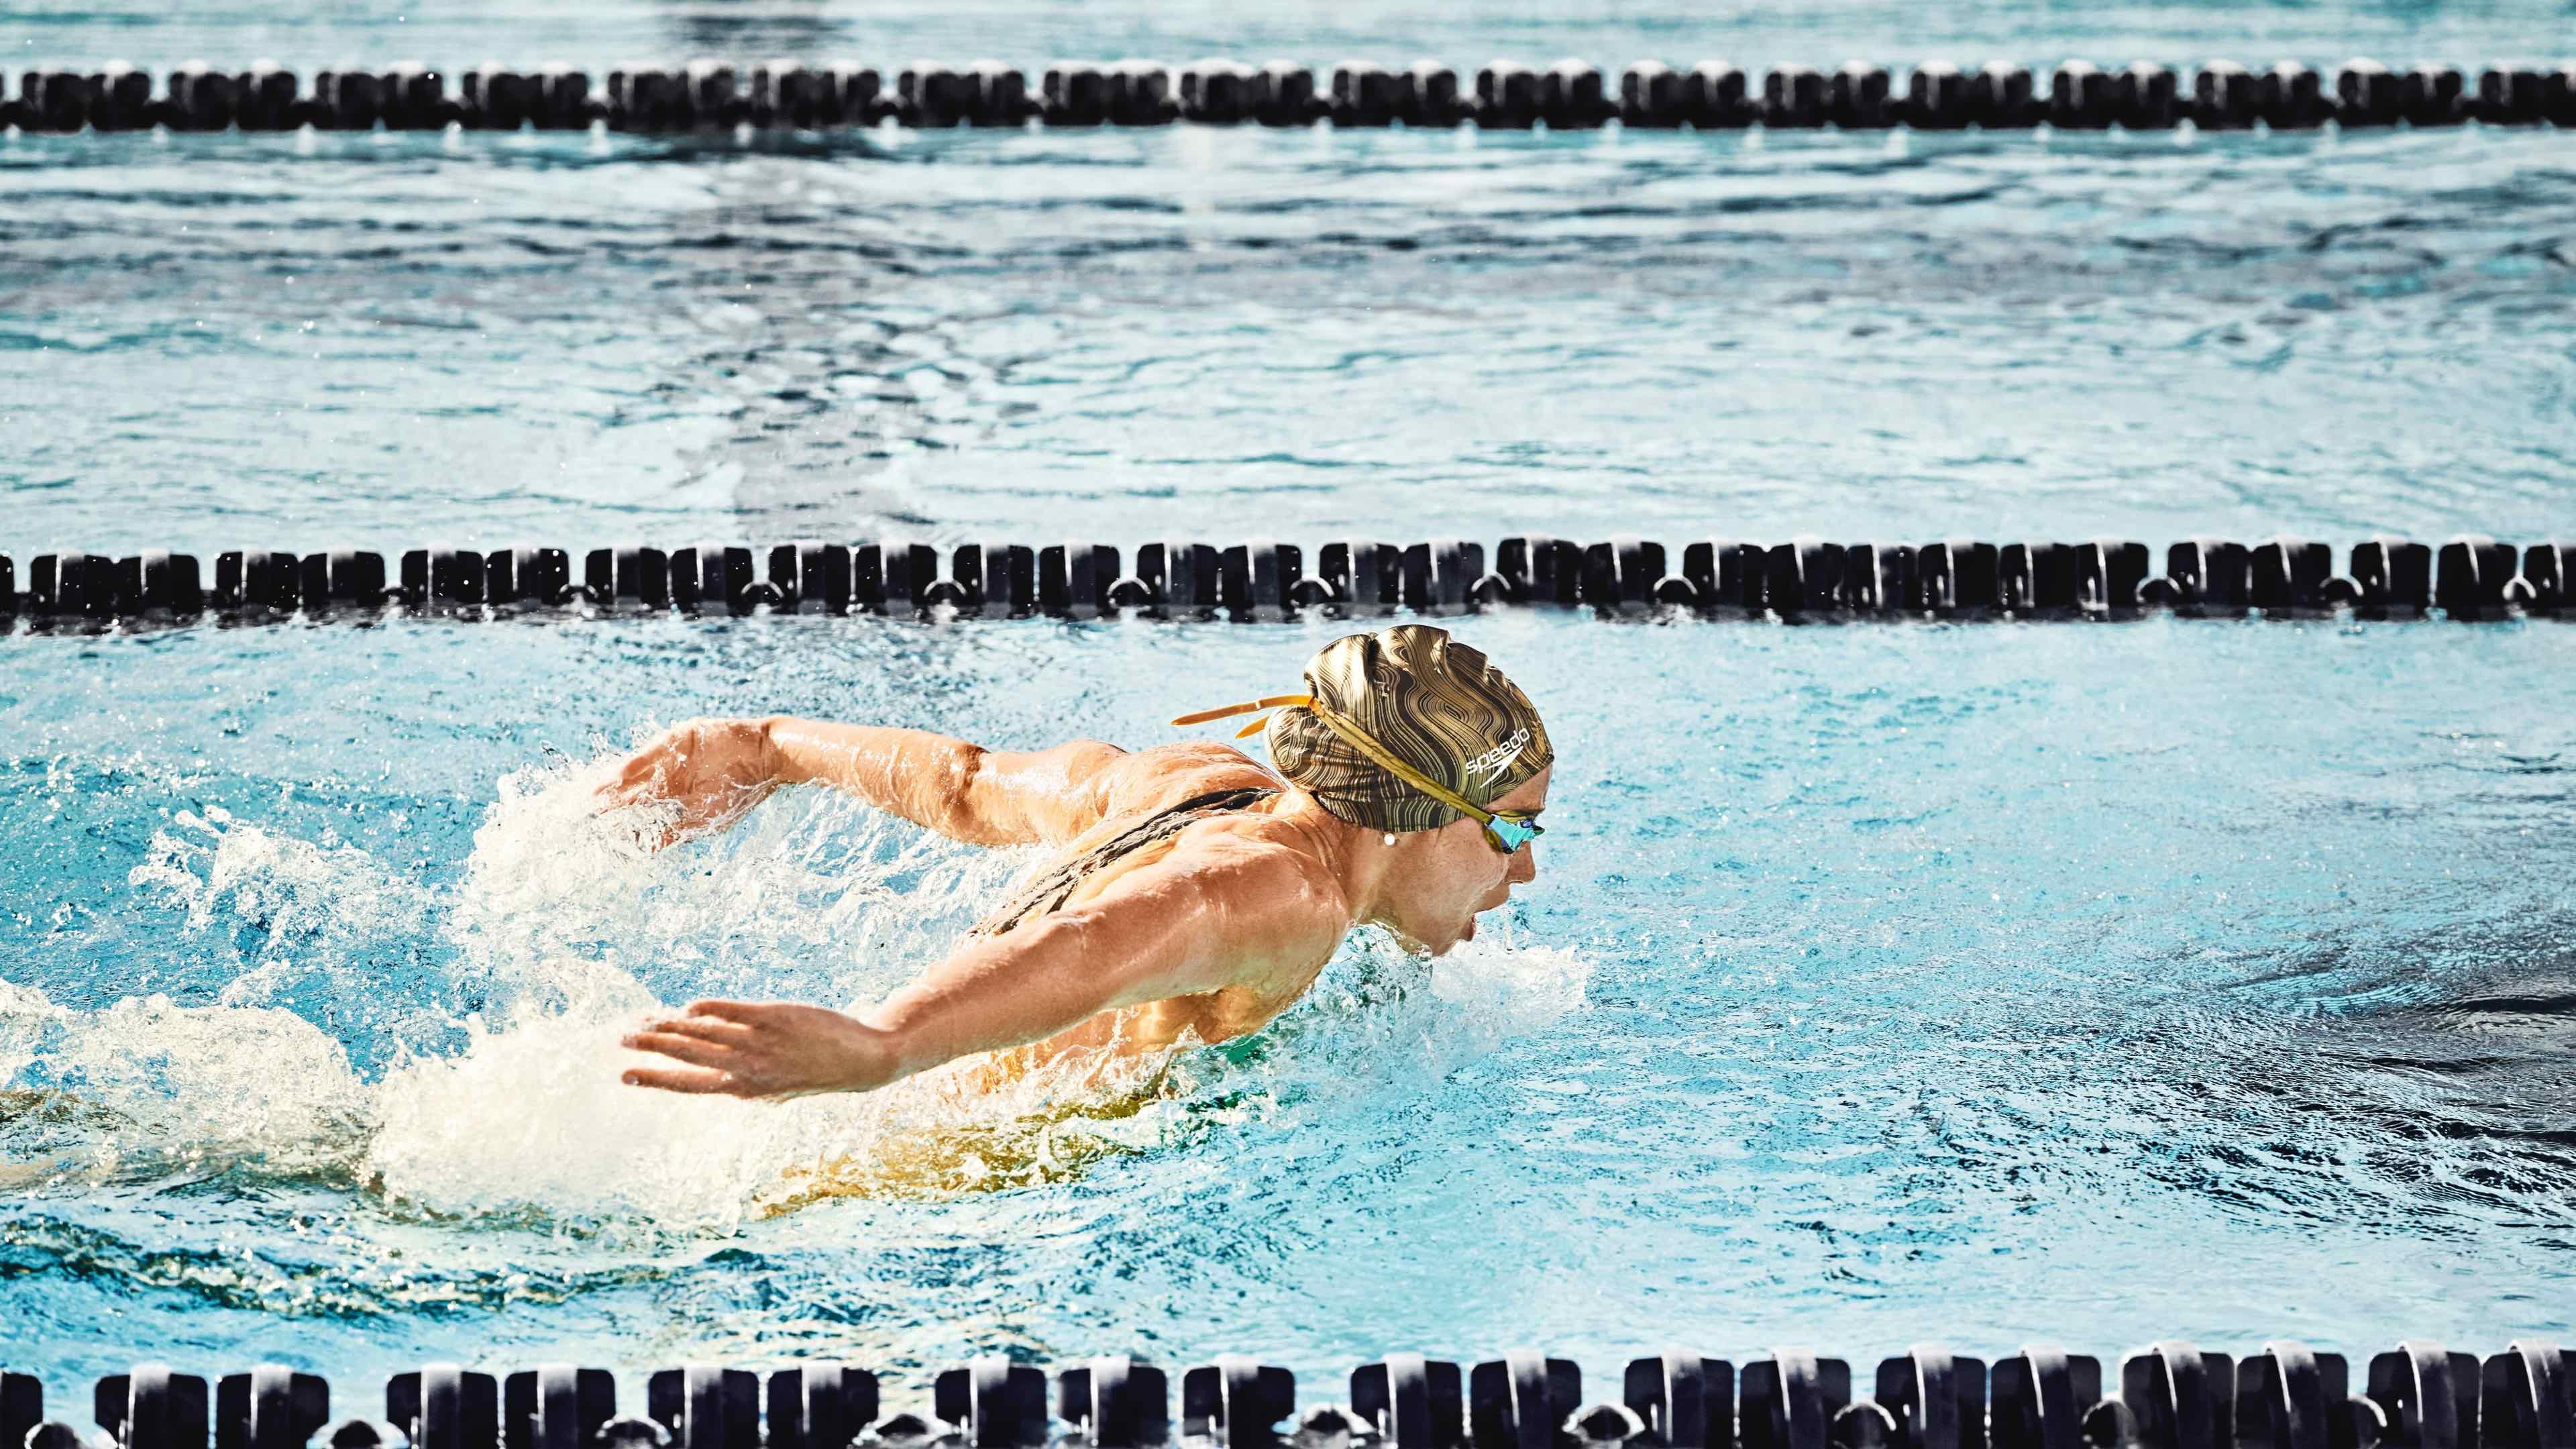 Speedo athlete doing Butterfly stroke